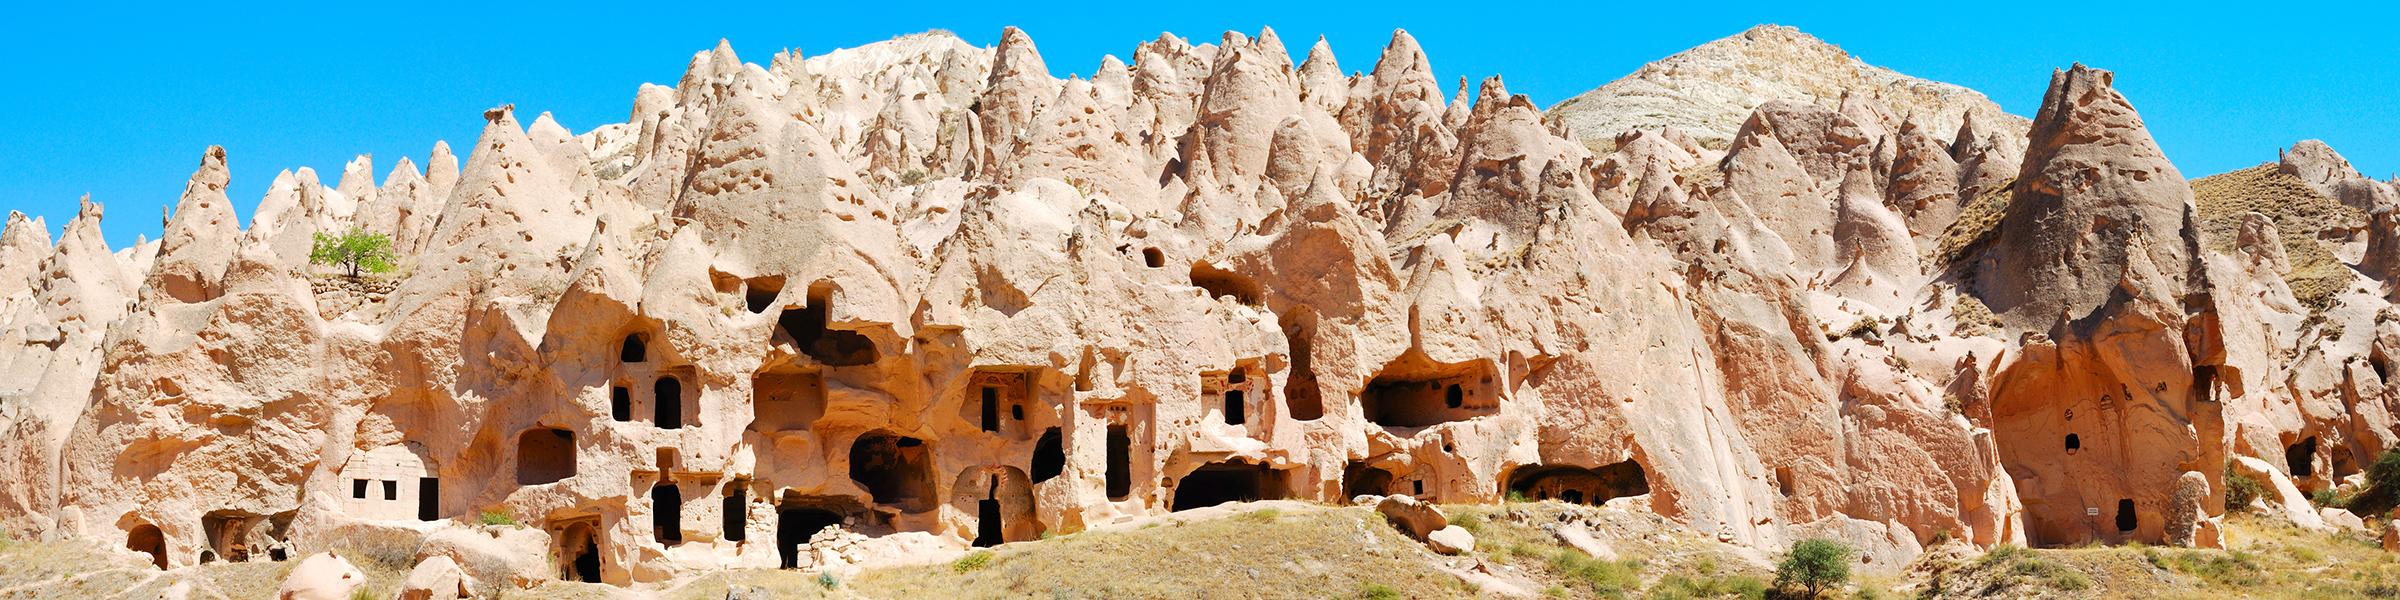 Turkey Cappadocia Göreme National Park